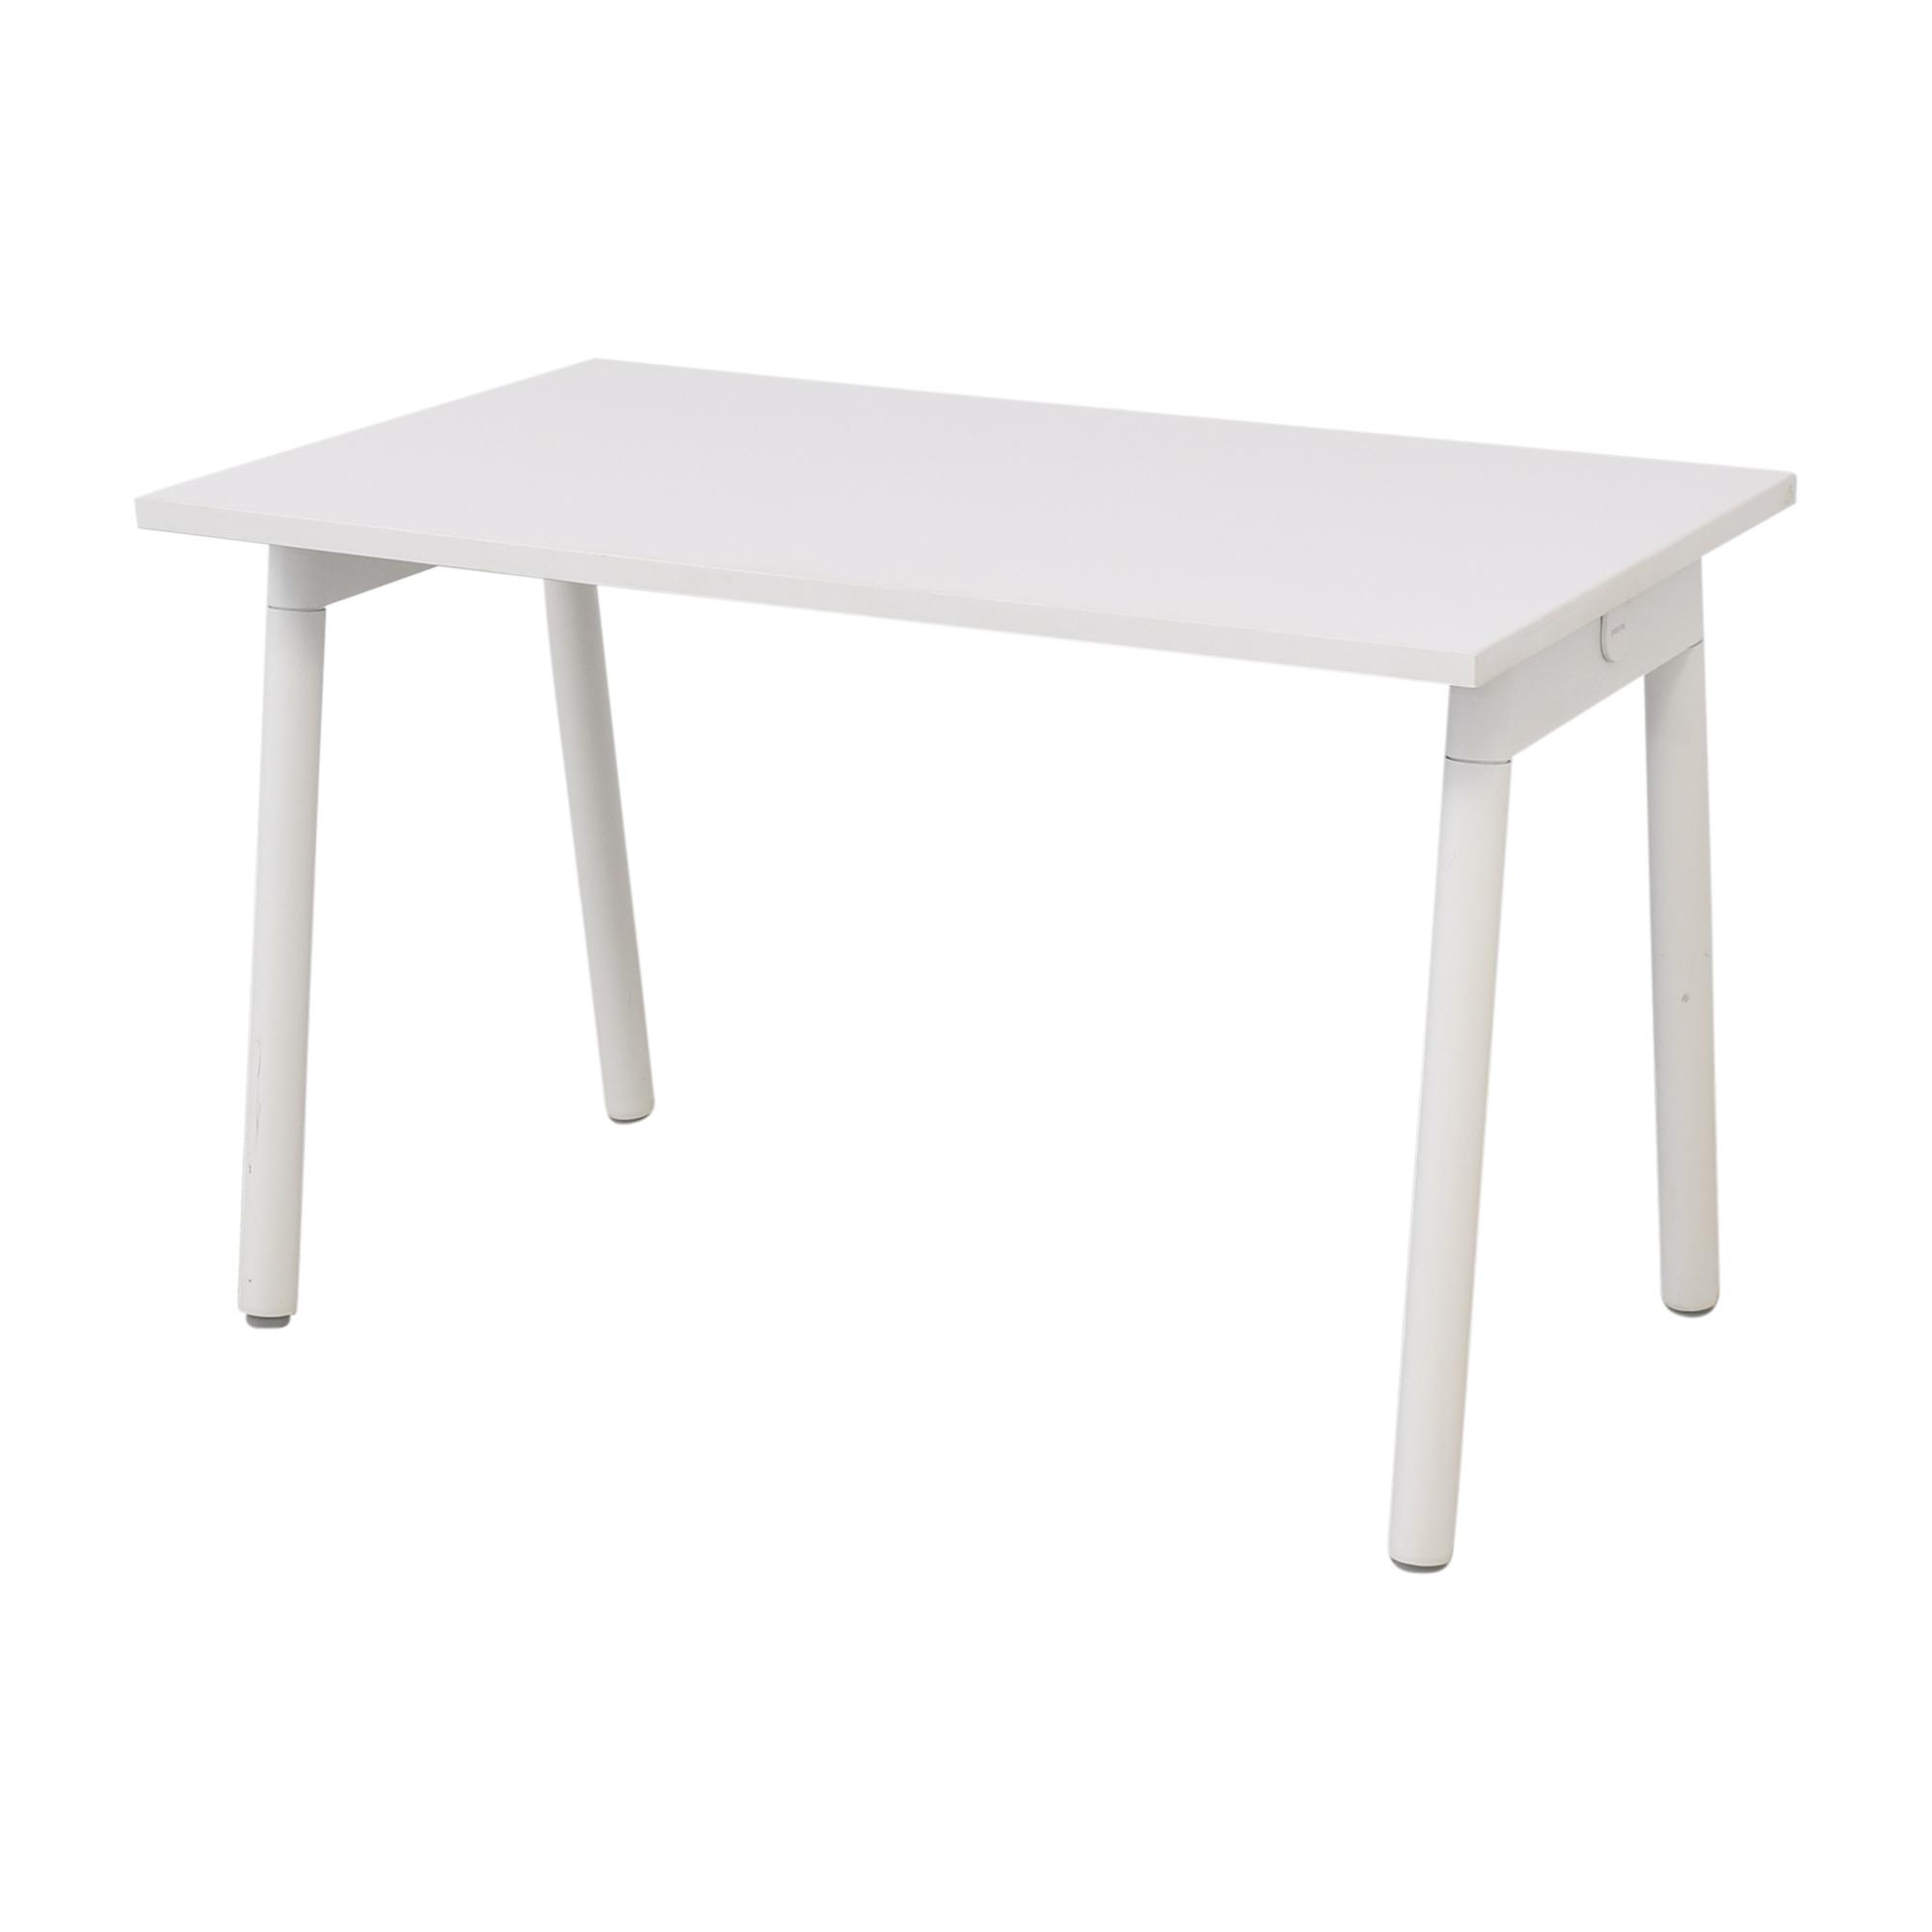 Poppin Poppin Series A Single Desk price